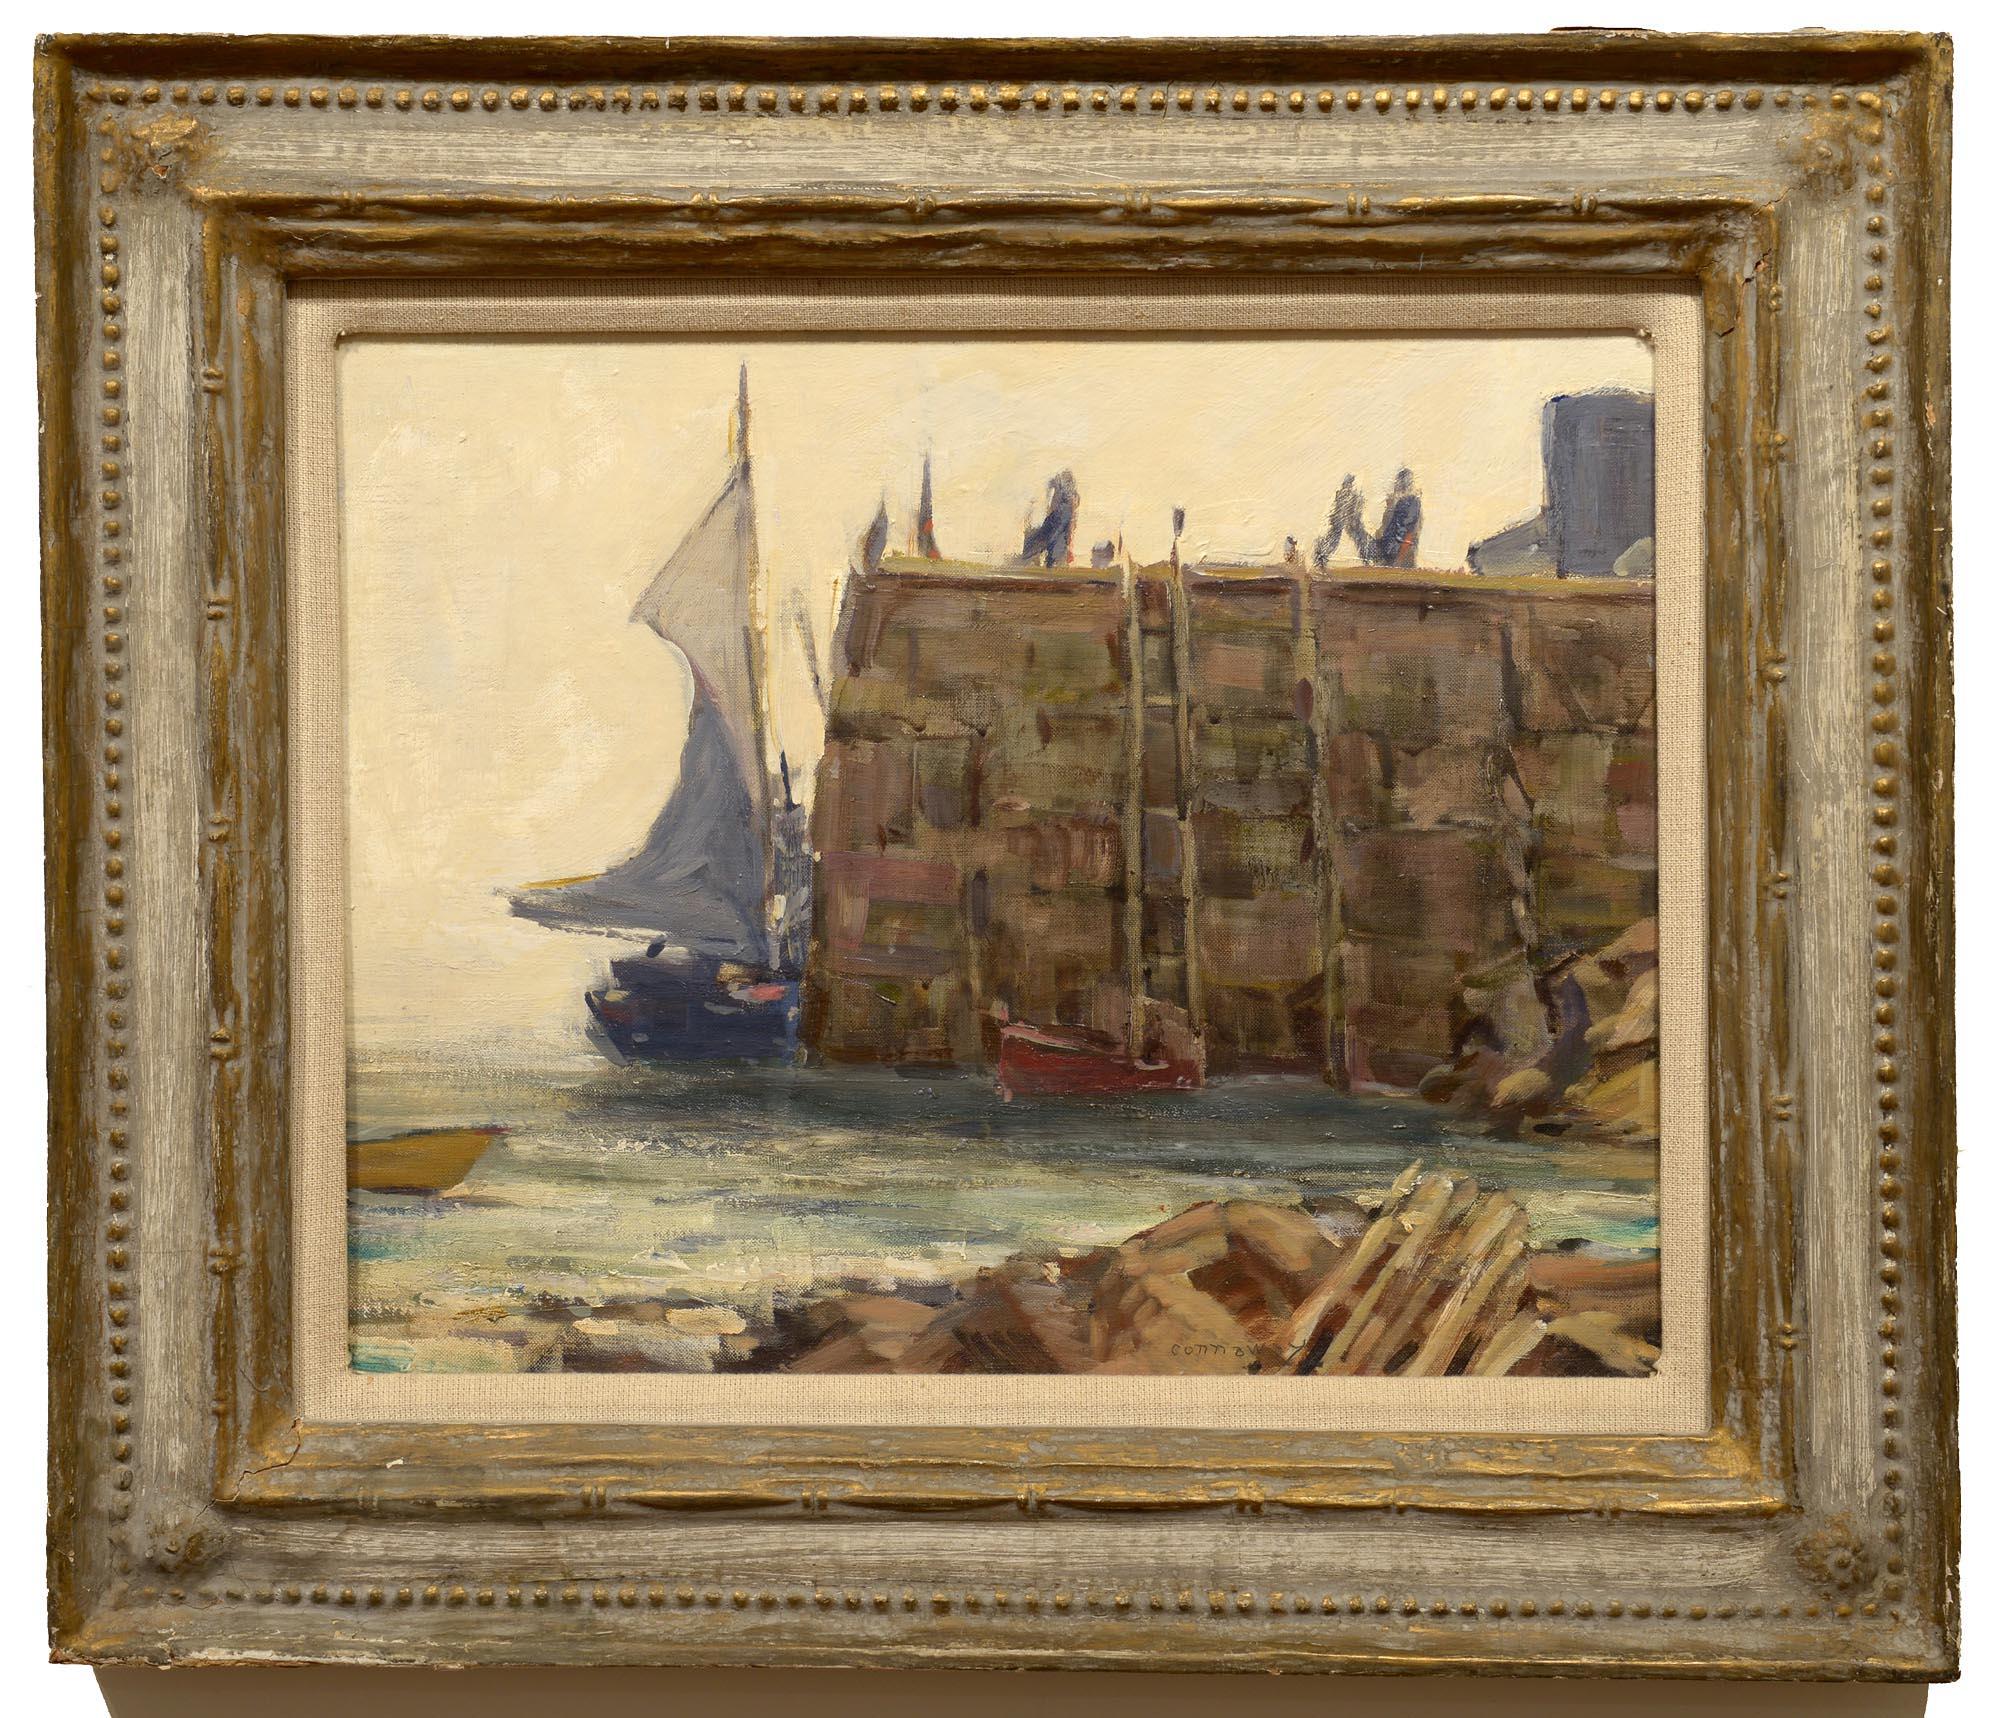 Jay Hall Connaway Monhegan Dock, Low Tide framed